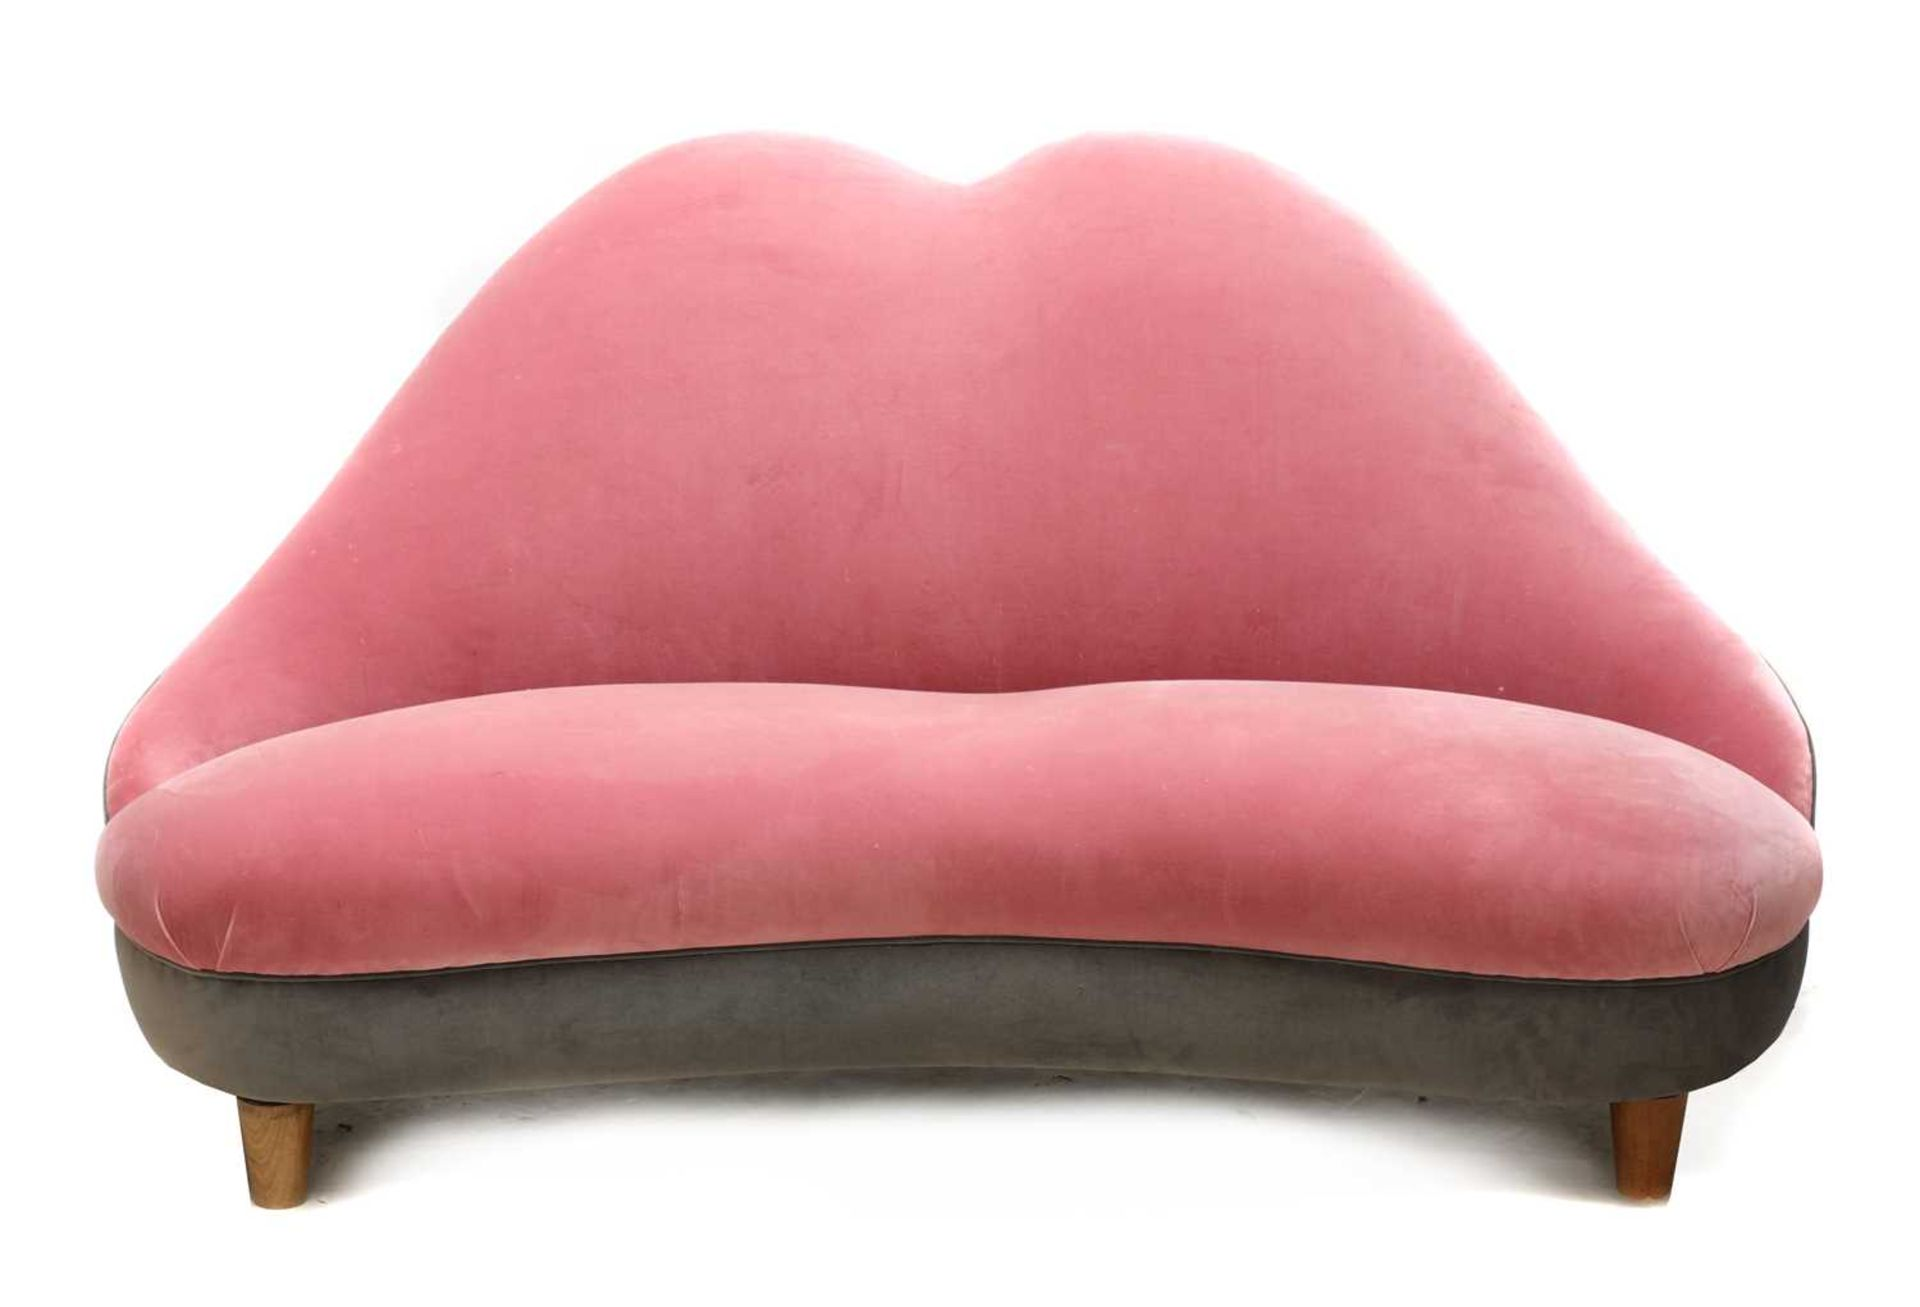 An Italian 'lips' shaped sofa, - Image 3 of 3